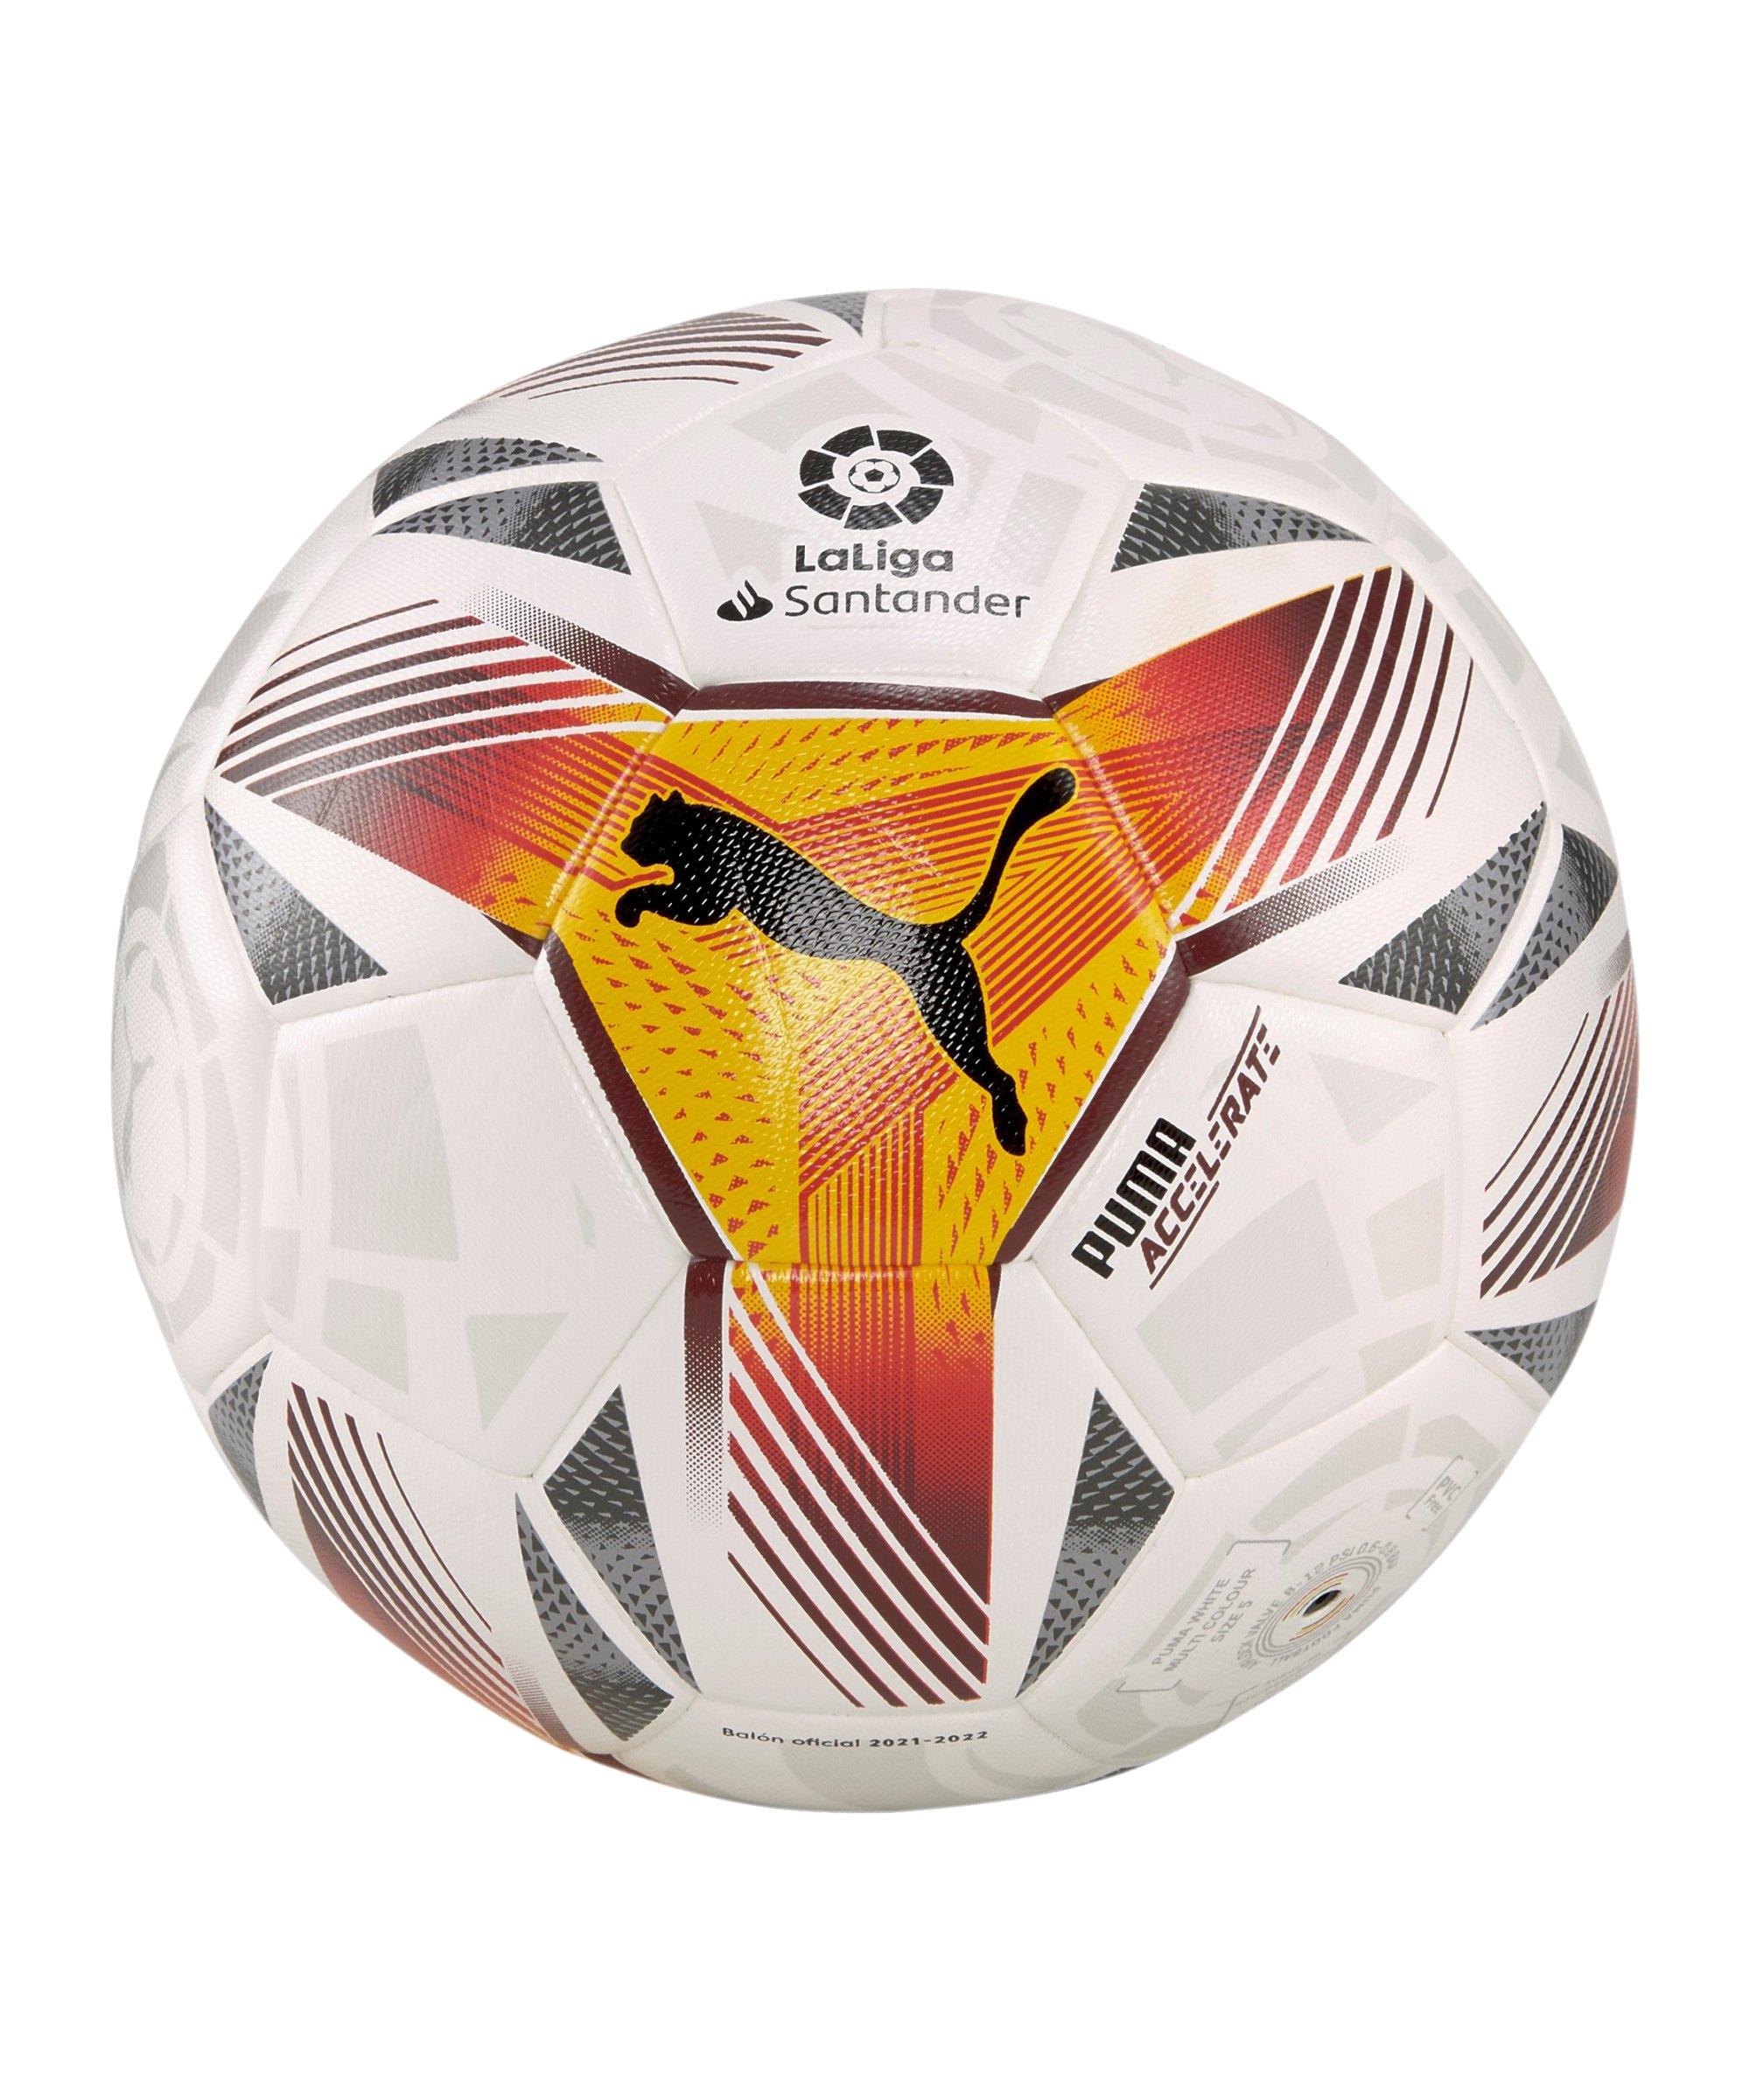 PUMA LaLiga 1 Accelerate Hybrid Trainingsball F01 - weiss